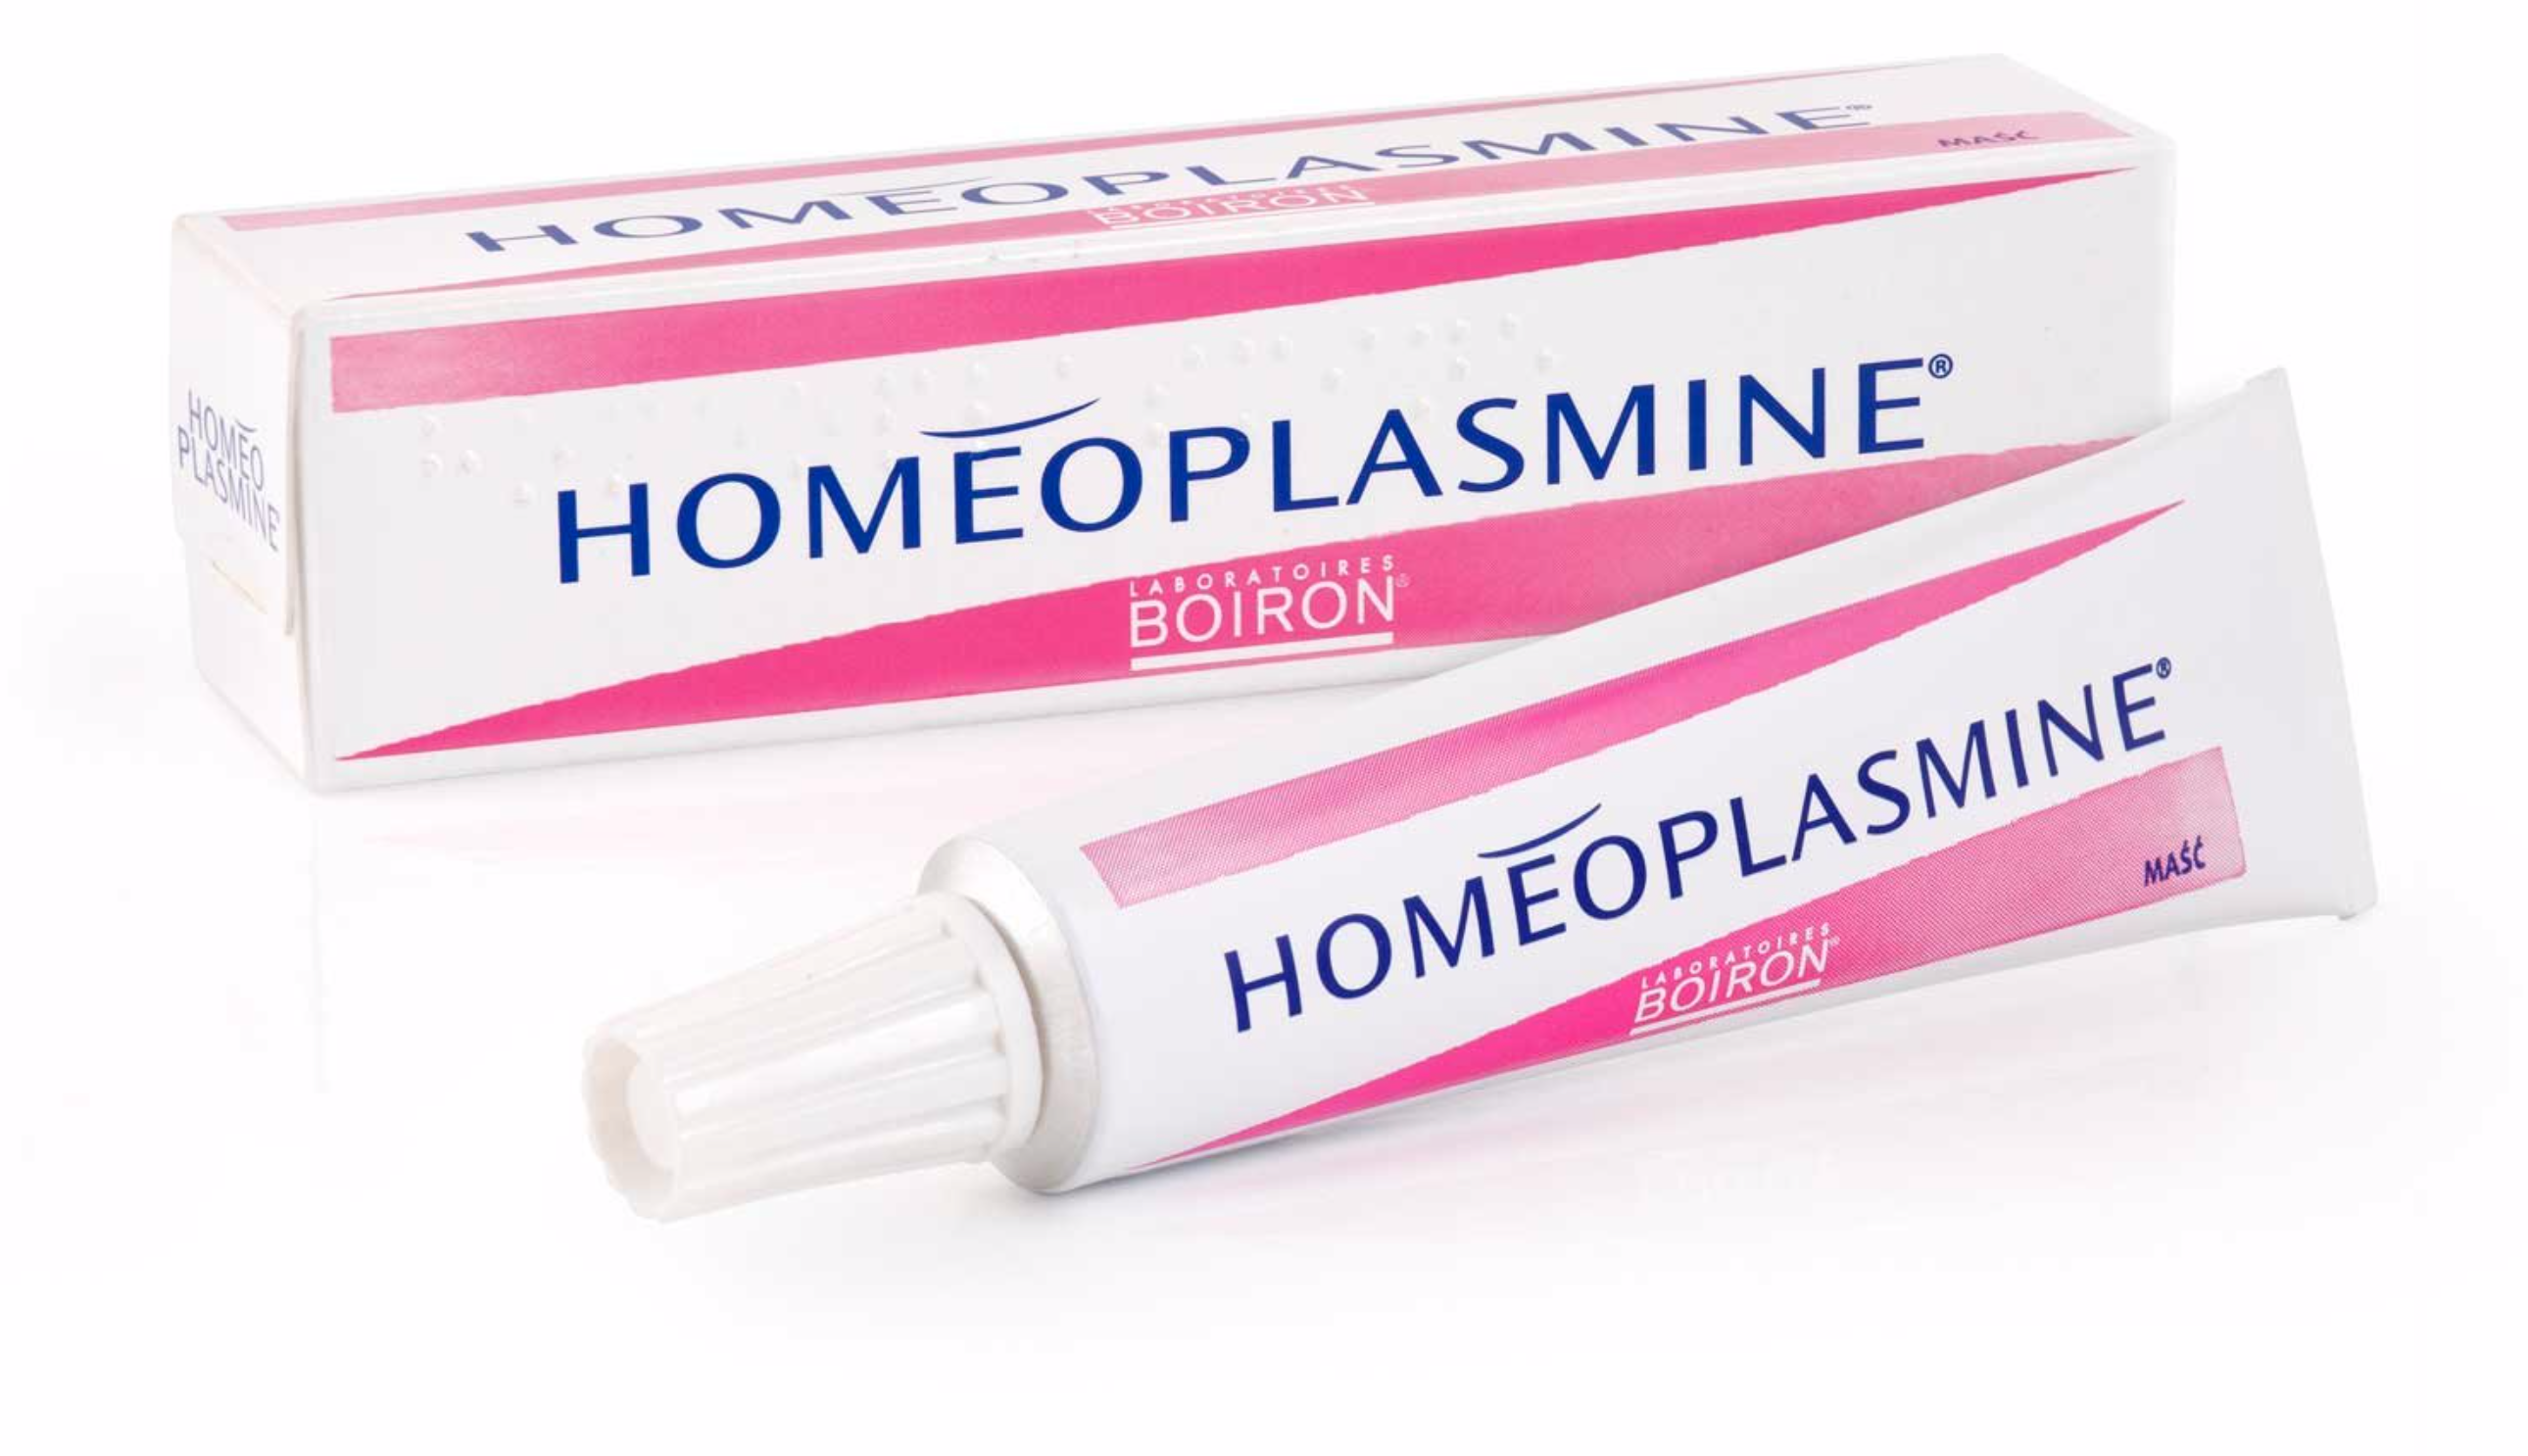 Boiron Homeoplasmine Multipurpose Ointment